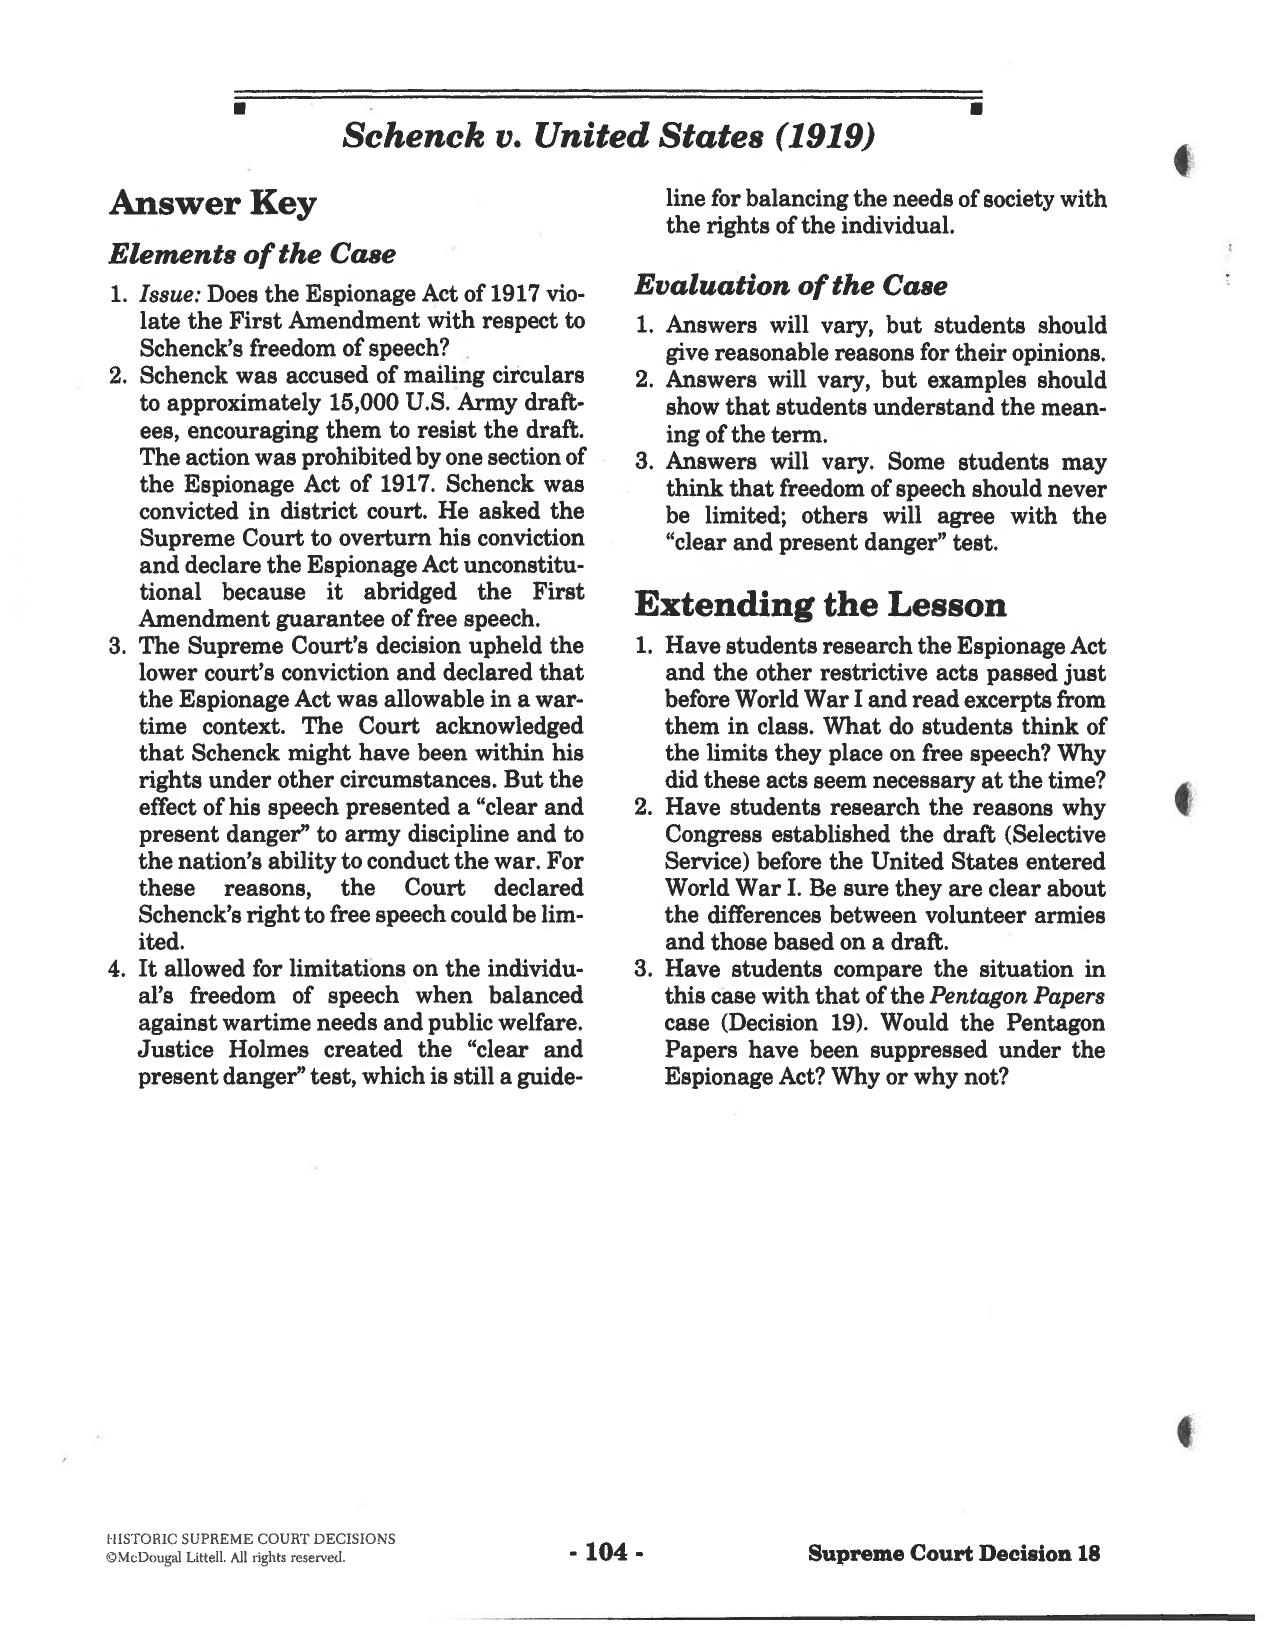 Analyzing Supreme Court Cases Worksheet - Nidecmege